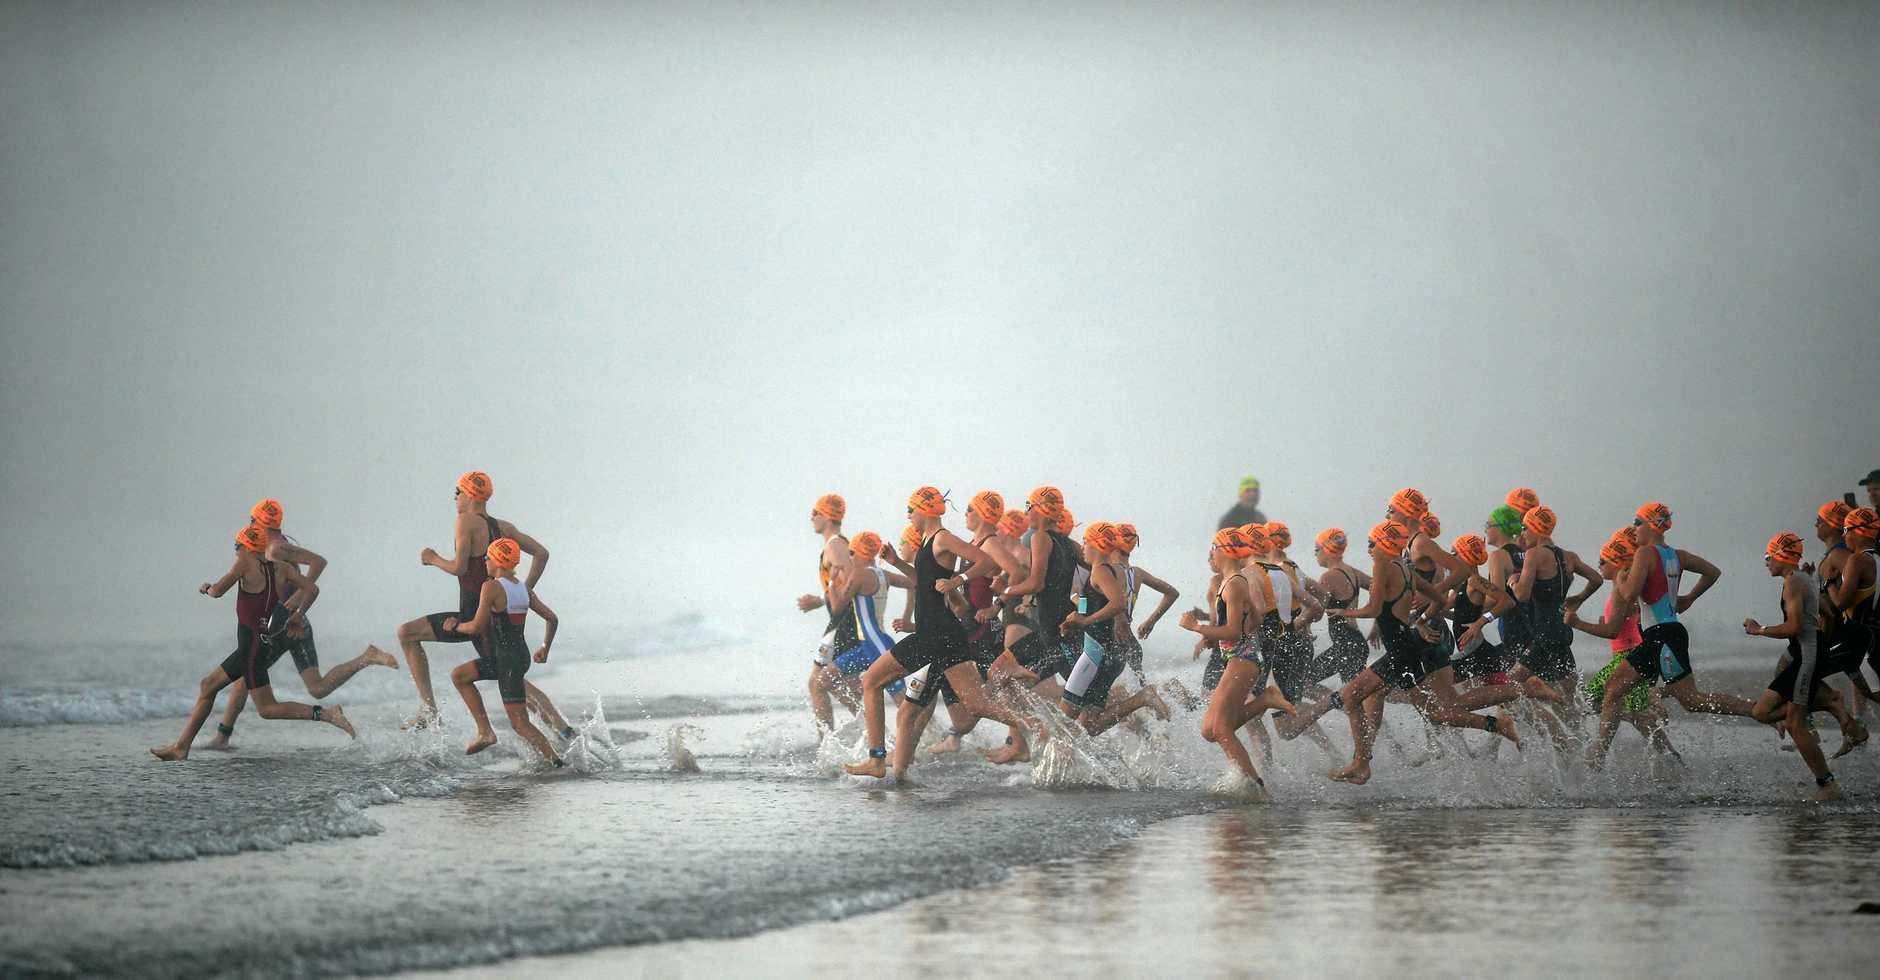 Yeppoon triathlon festival, start of enticer.